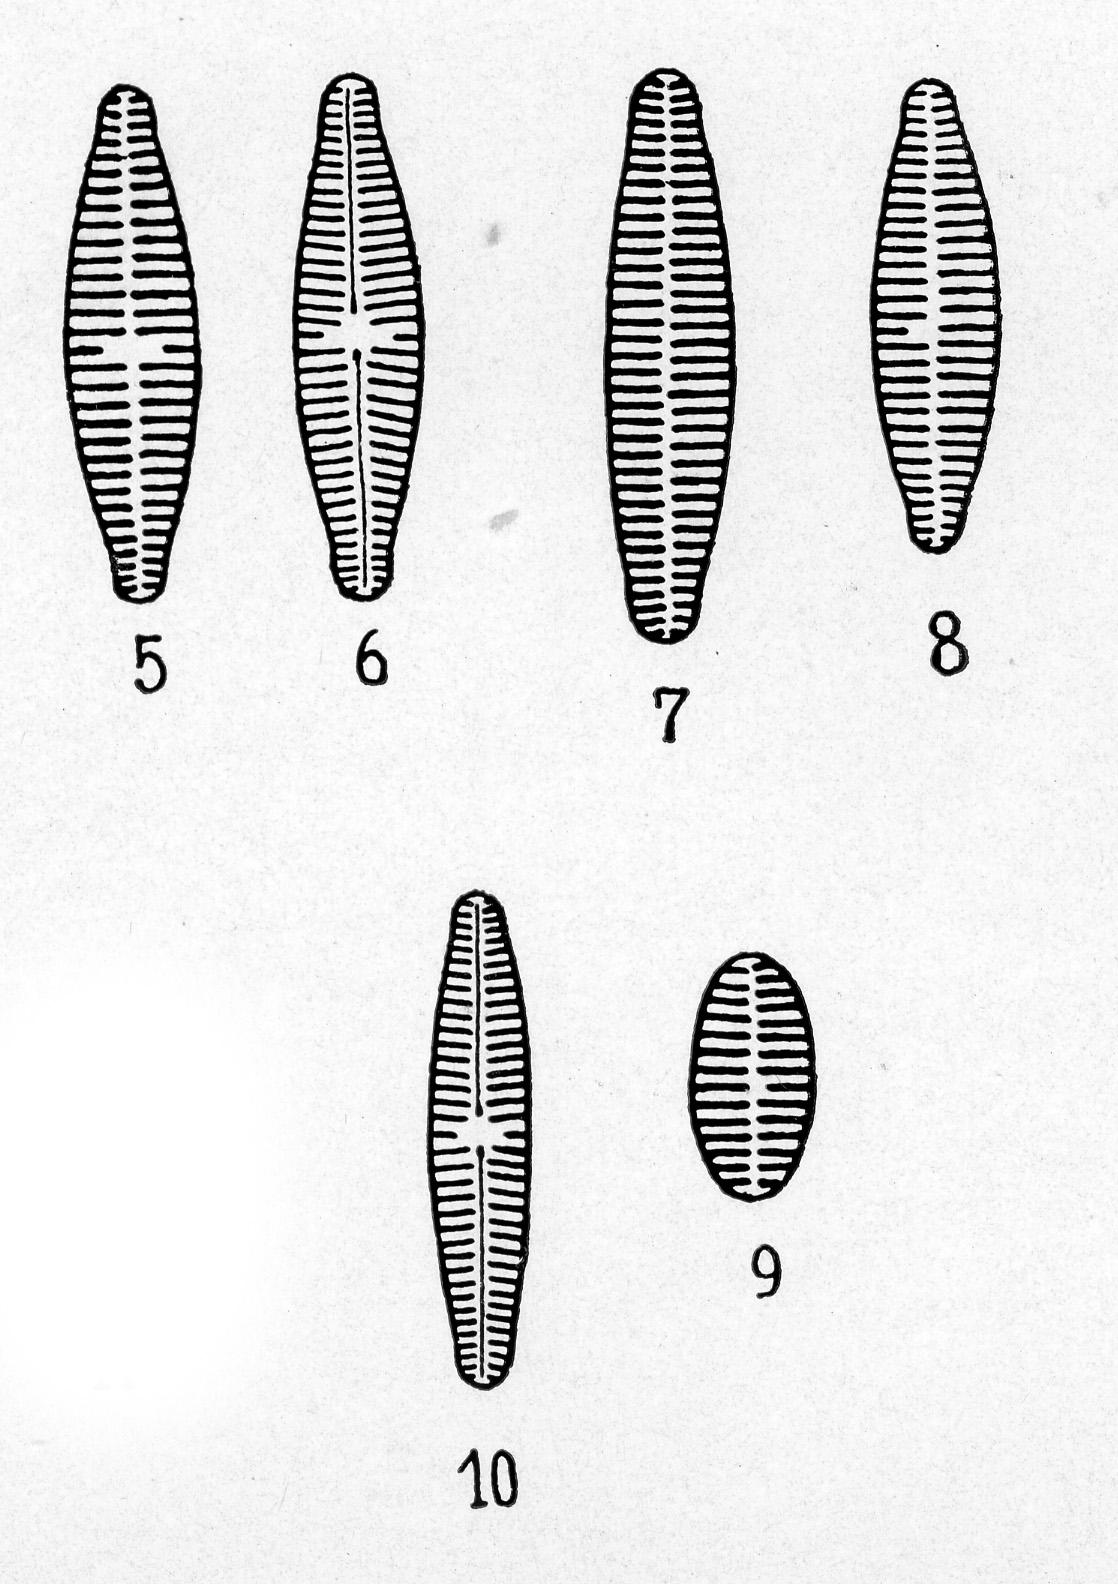 Achnanthes pyrenaica orig illus